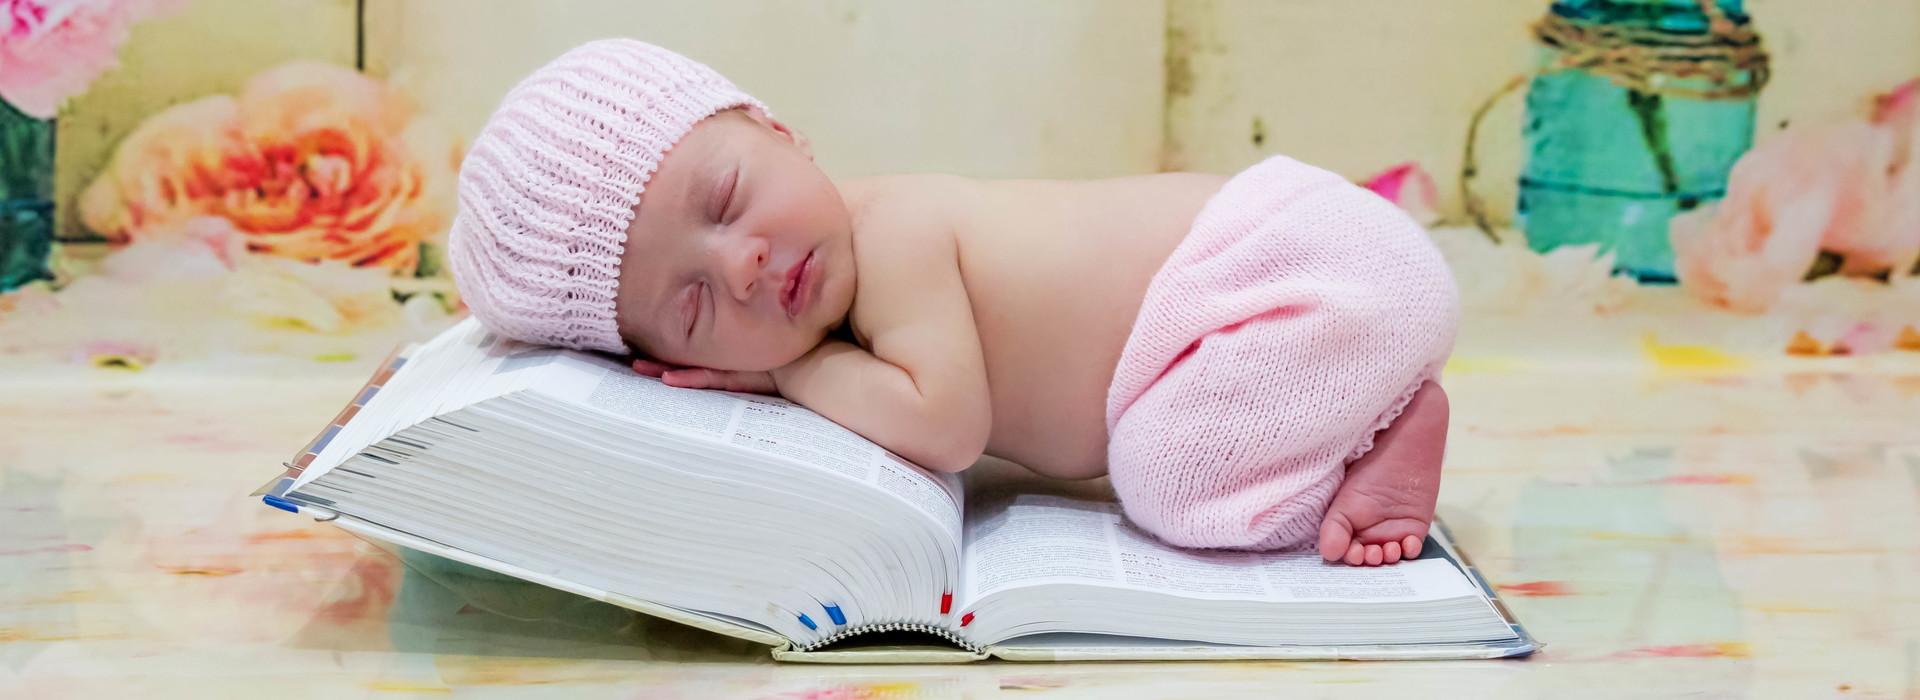 Newborn de Louise - 12 dias em Itu / SP